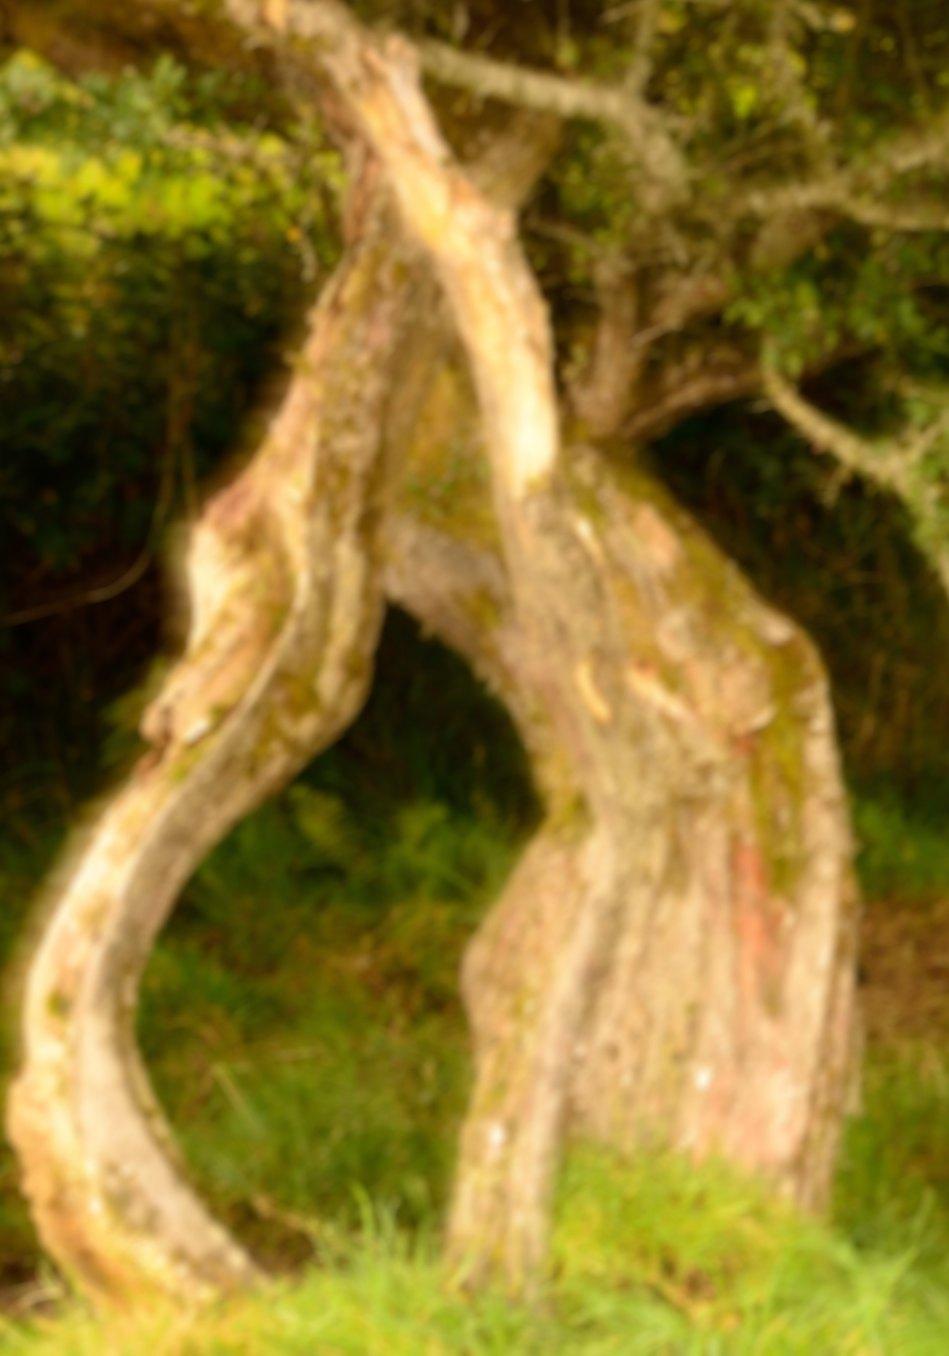 Impression of a tree